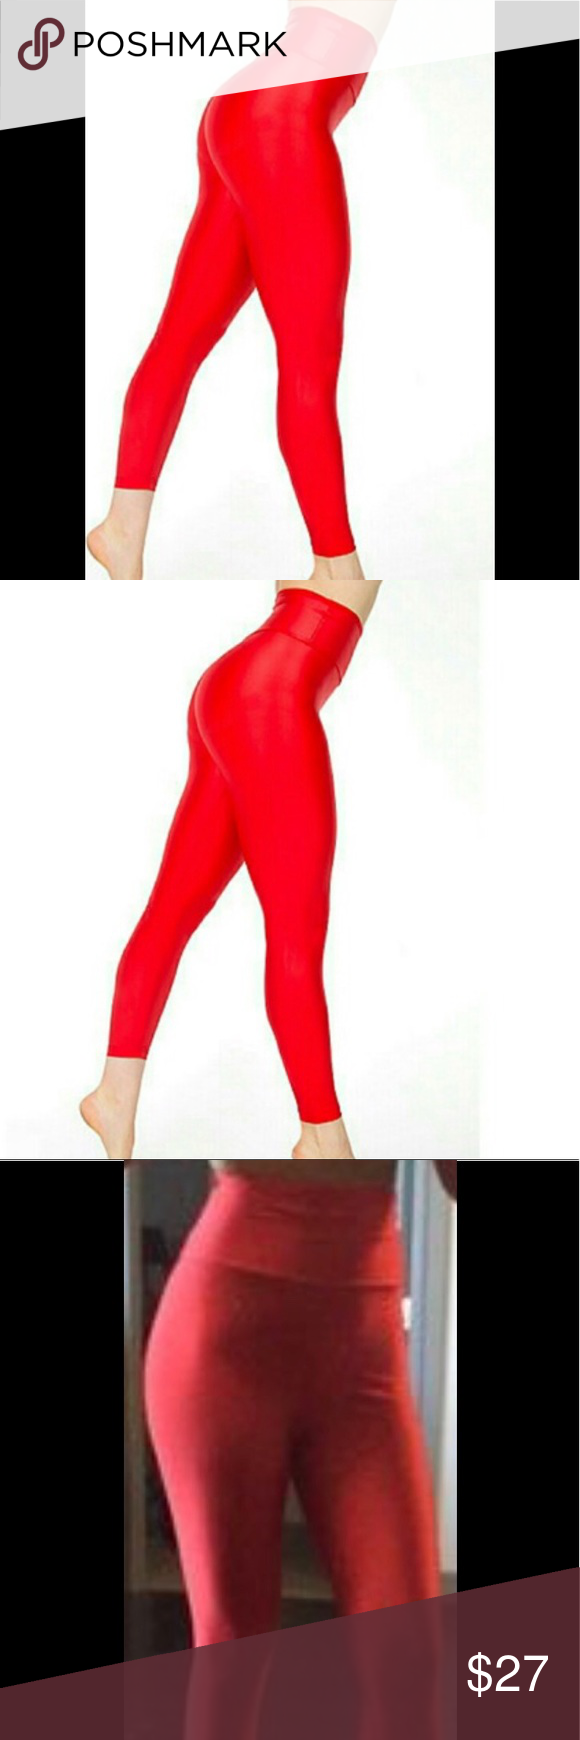 40d93d99da1b68 XS American Apparel high waist leggings American apparel Sz XS Form Fitted  (feel like compression